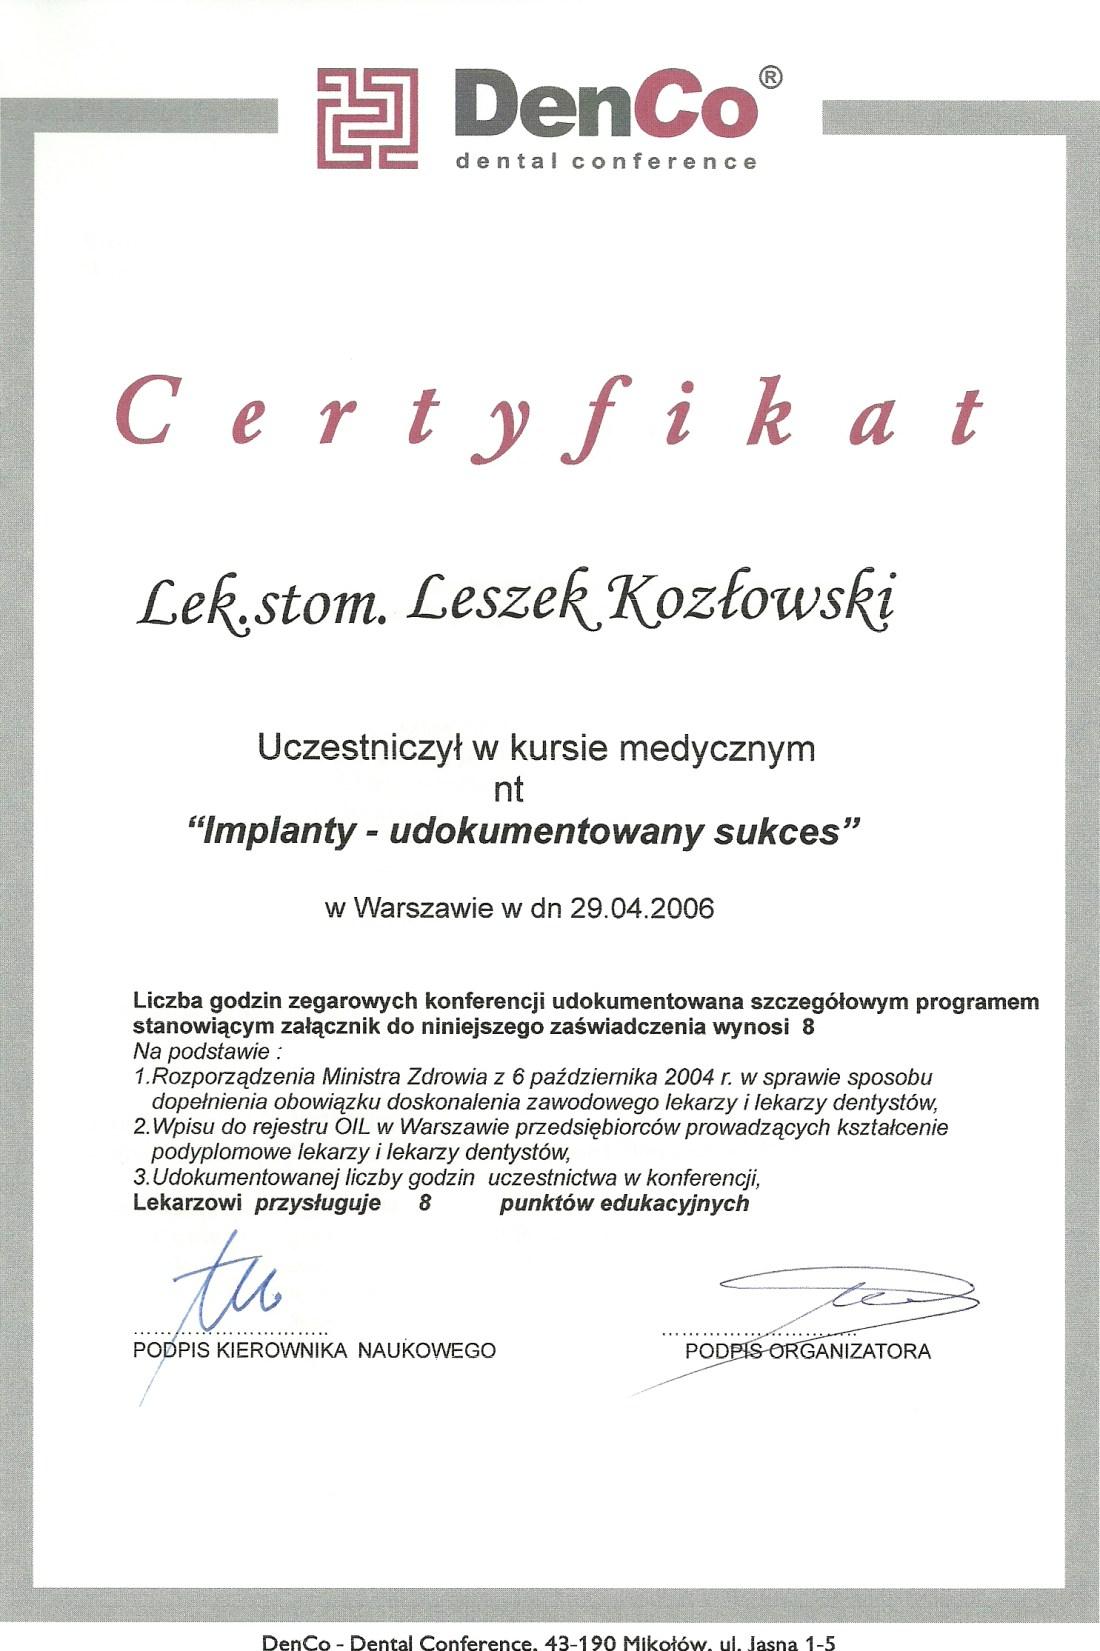 dentysta warszawa DENTYSTA WARSZAWA – DENTOKLINIKA Dentysta warszawa Leszek Kozlowski Certyfikat 6